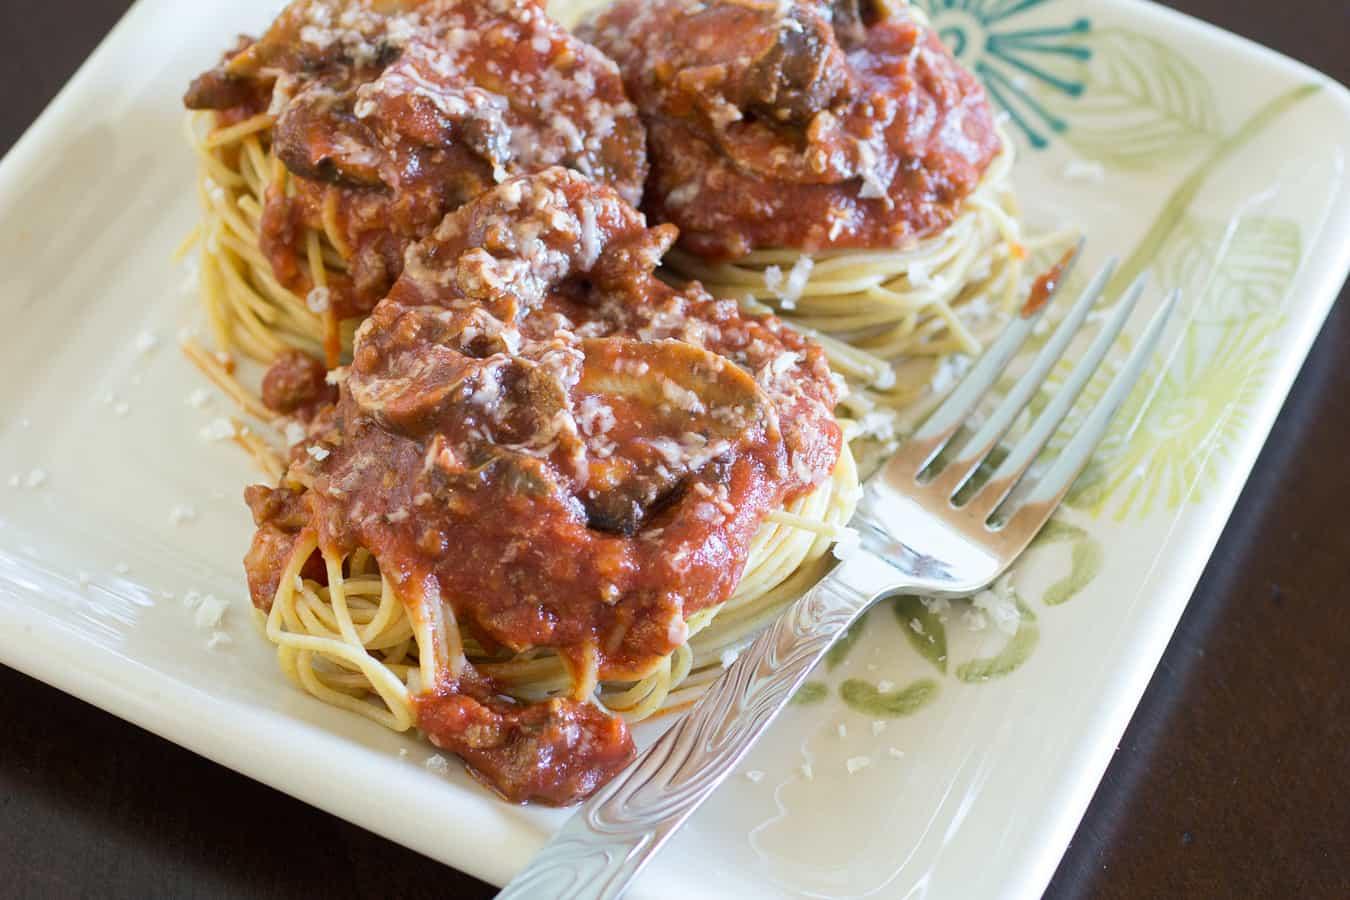 Spaghetti with Mushroom Meat Sauce